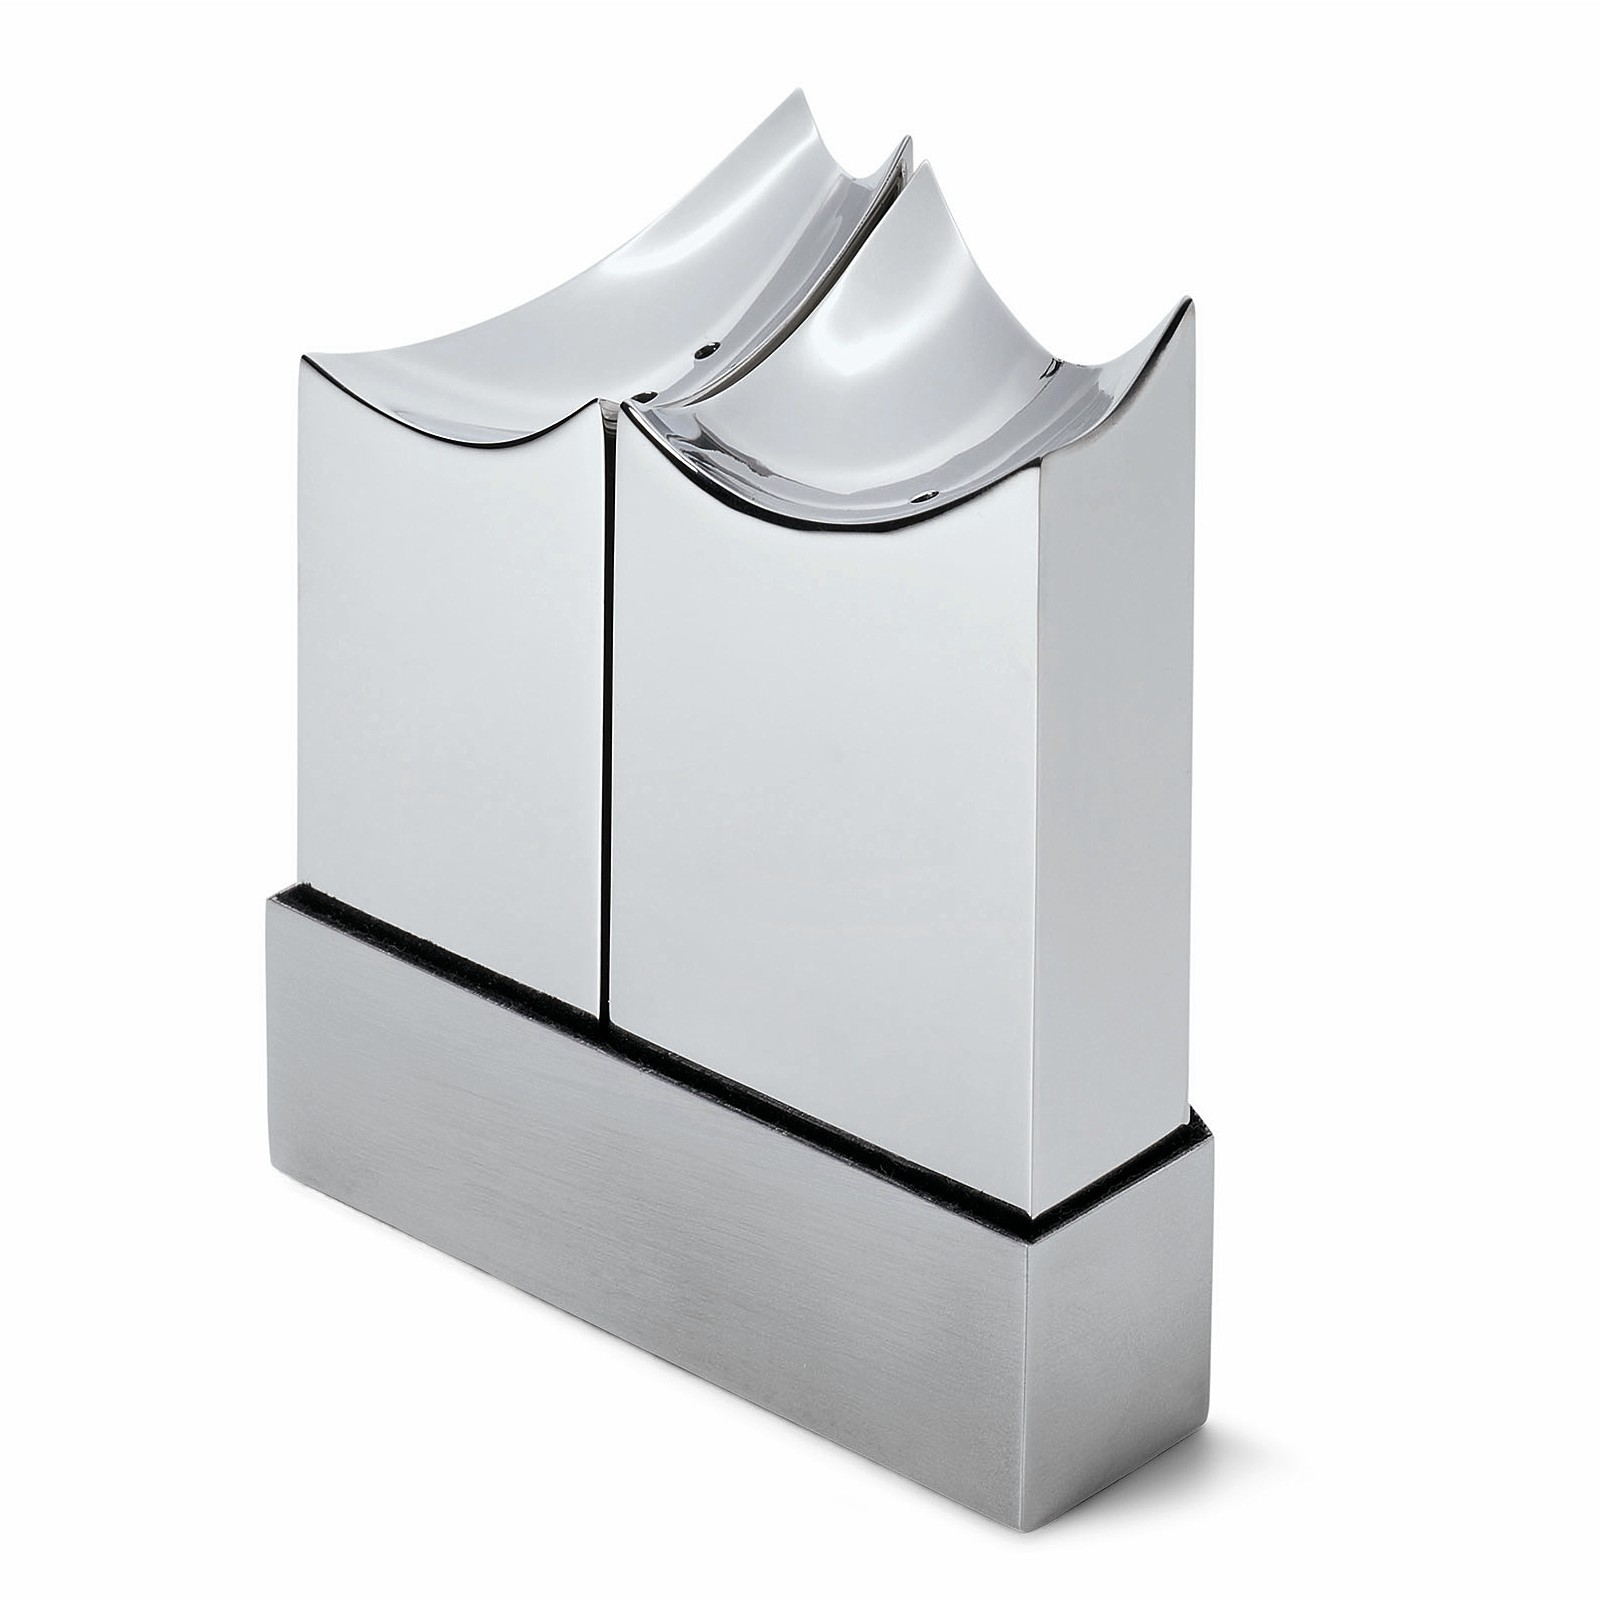 salz pfeffer streuer edelstahl philippi elbharmonie. Black Bedroom Furniture Sets. Home Design Ideas